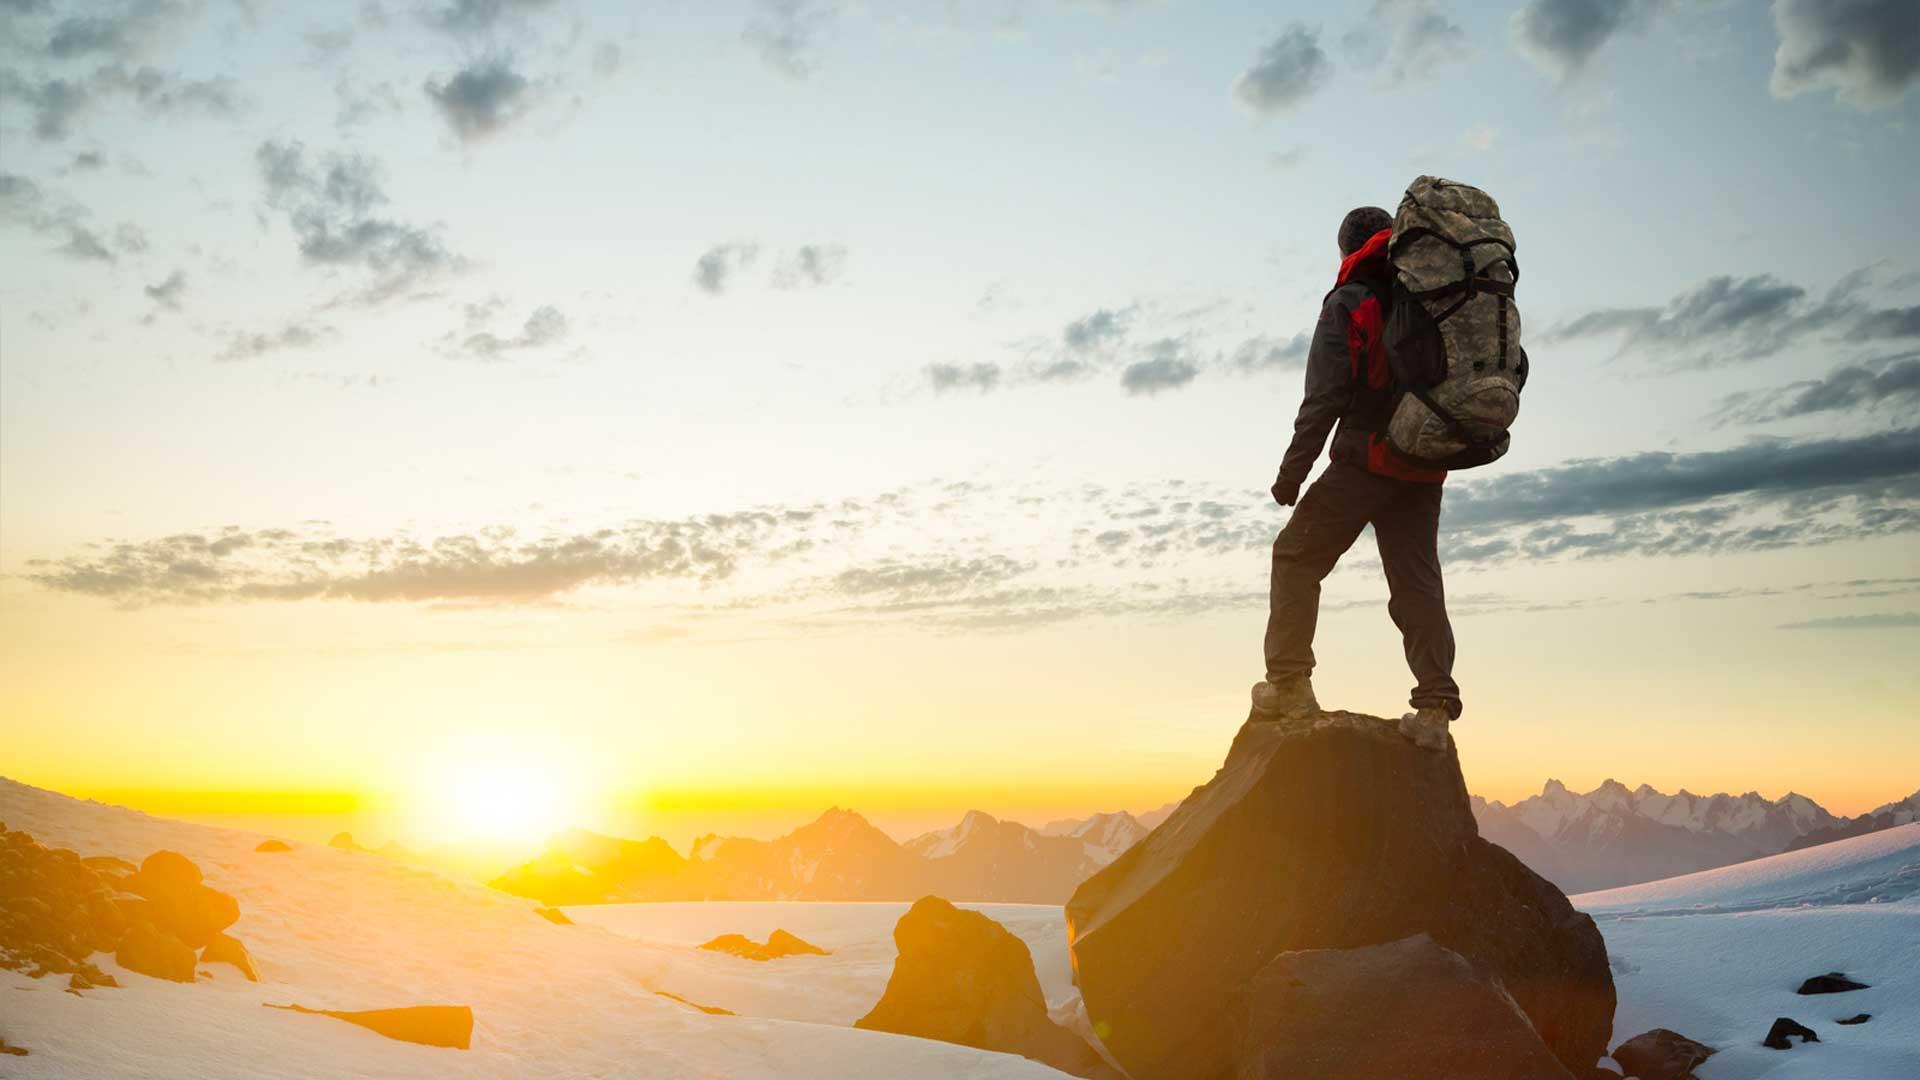 climber looking at mountain